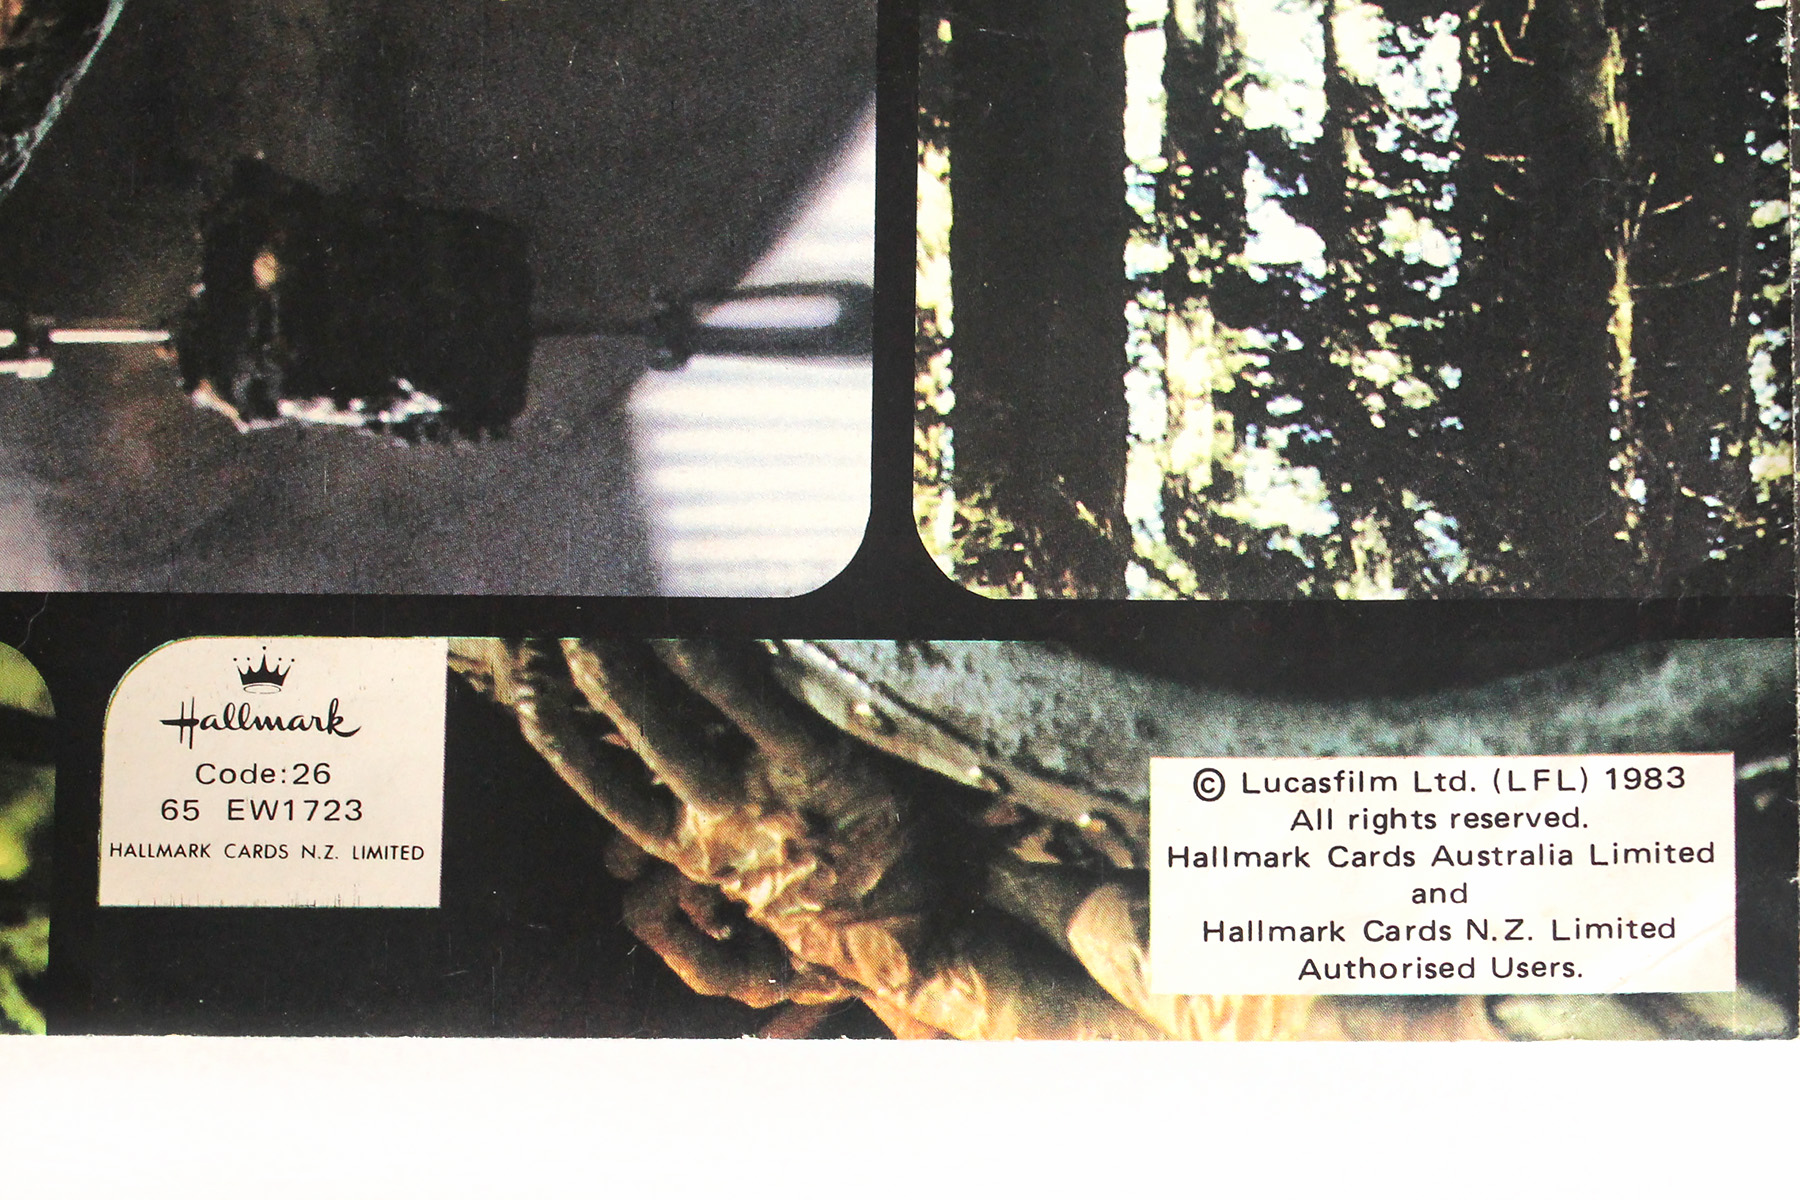 Vintage Wrapping Paper Hallmark Cards Nz Ltd Swnz Star Wars New